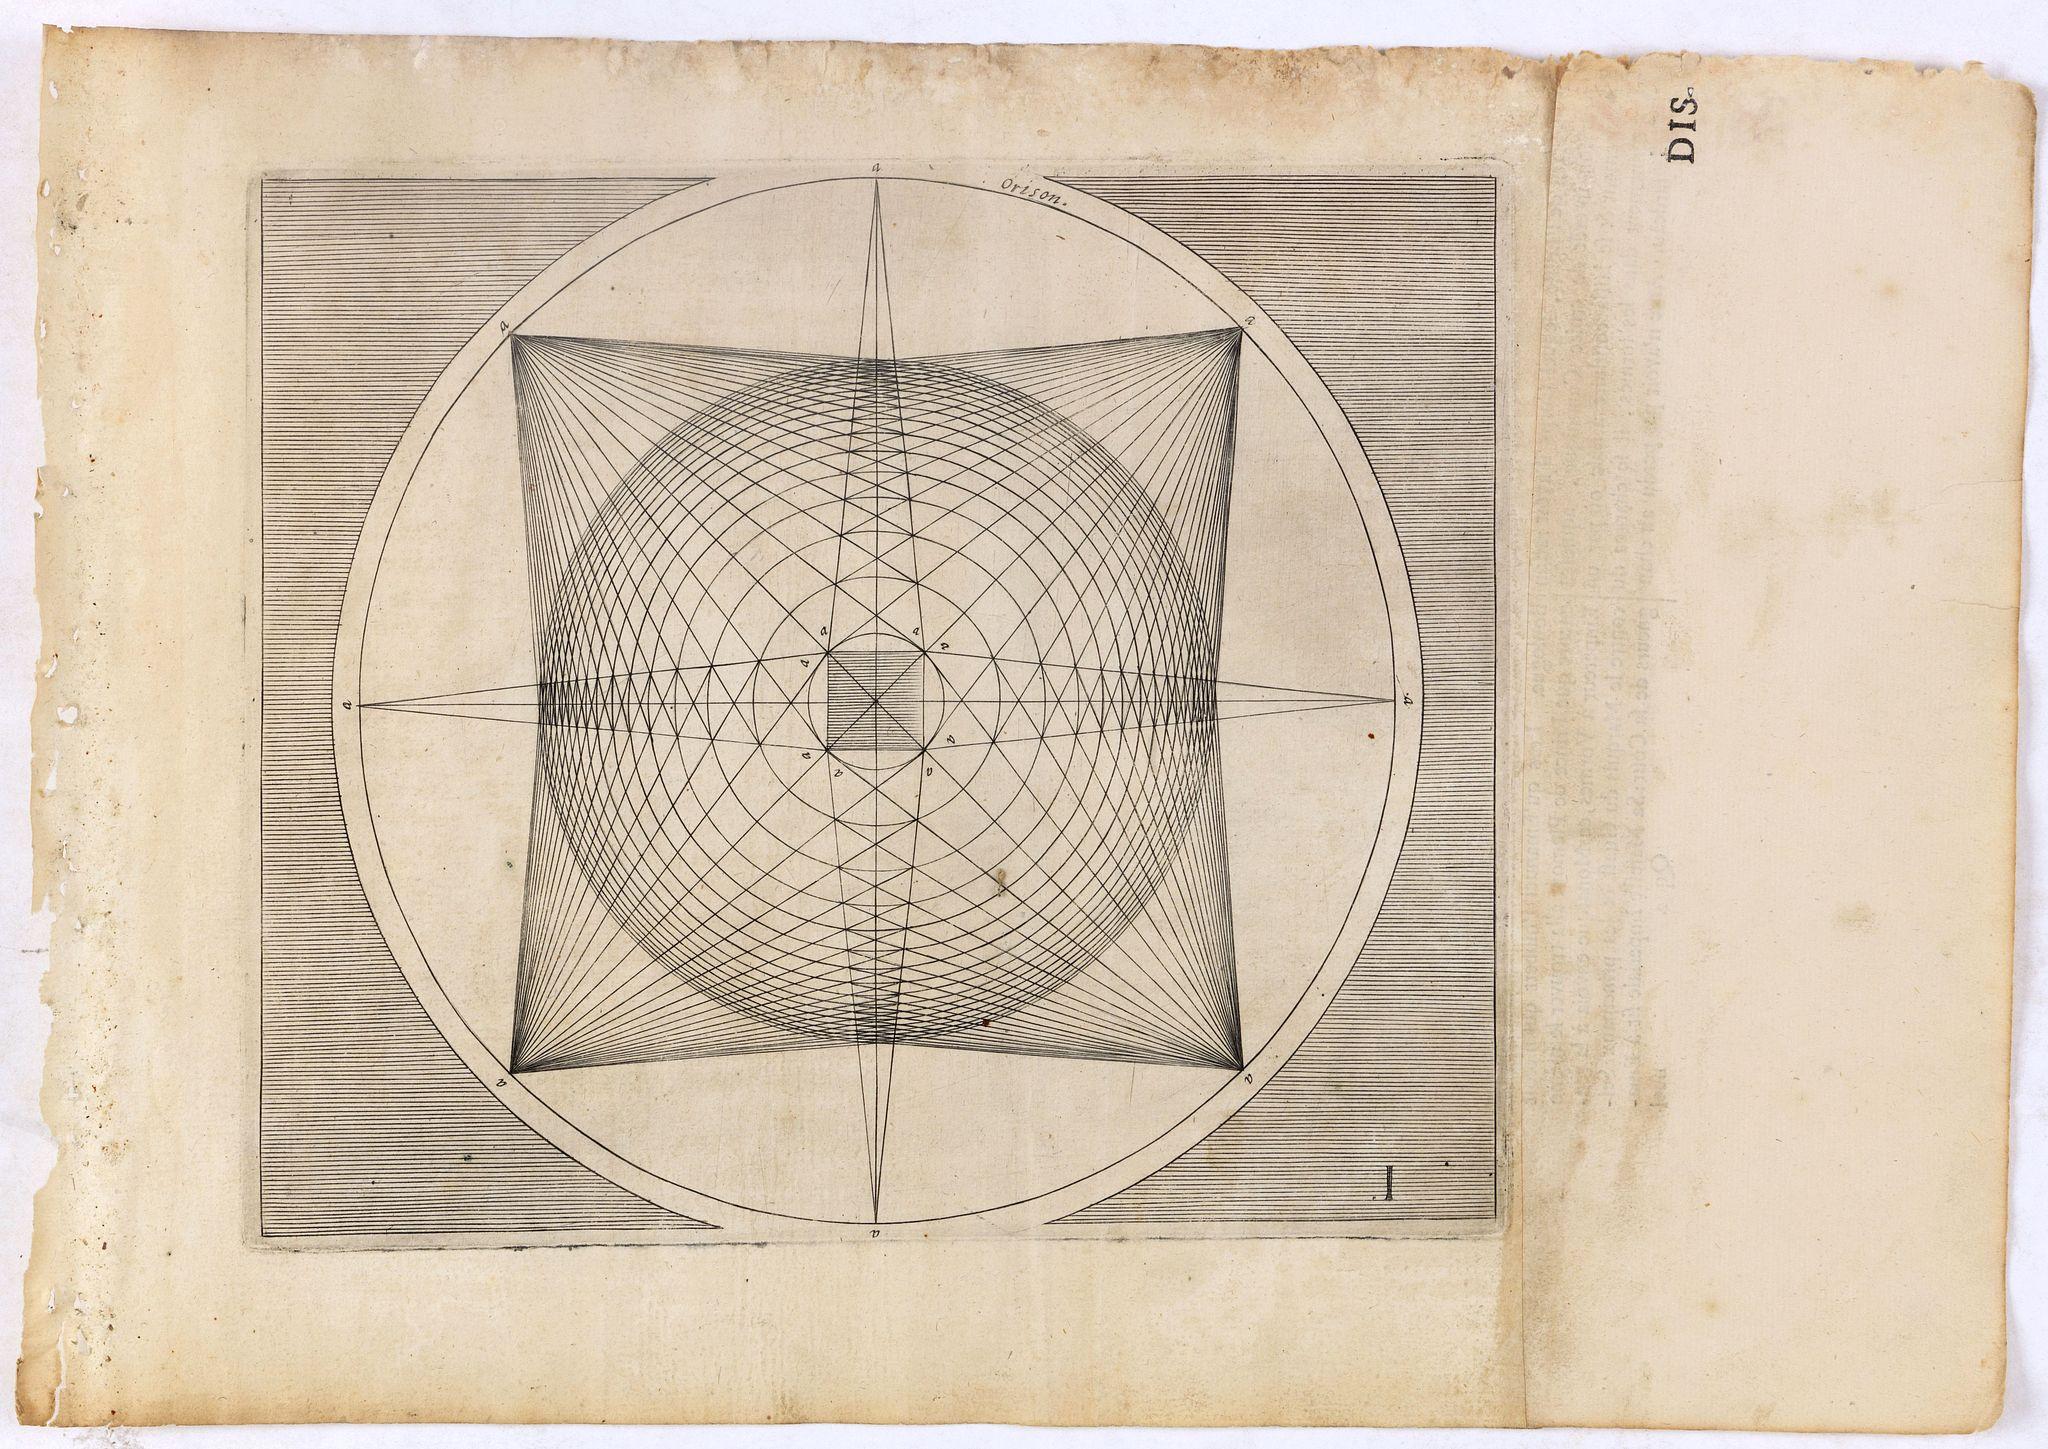 VREDEMAN DE VRIES, J. / HONDIUS, H. -  Perspective print by Vredeman de Vries. I